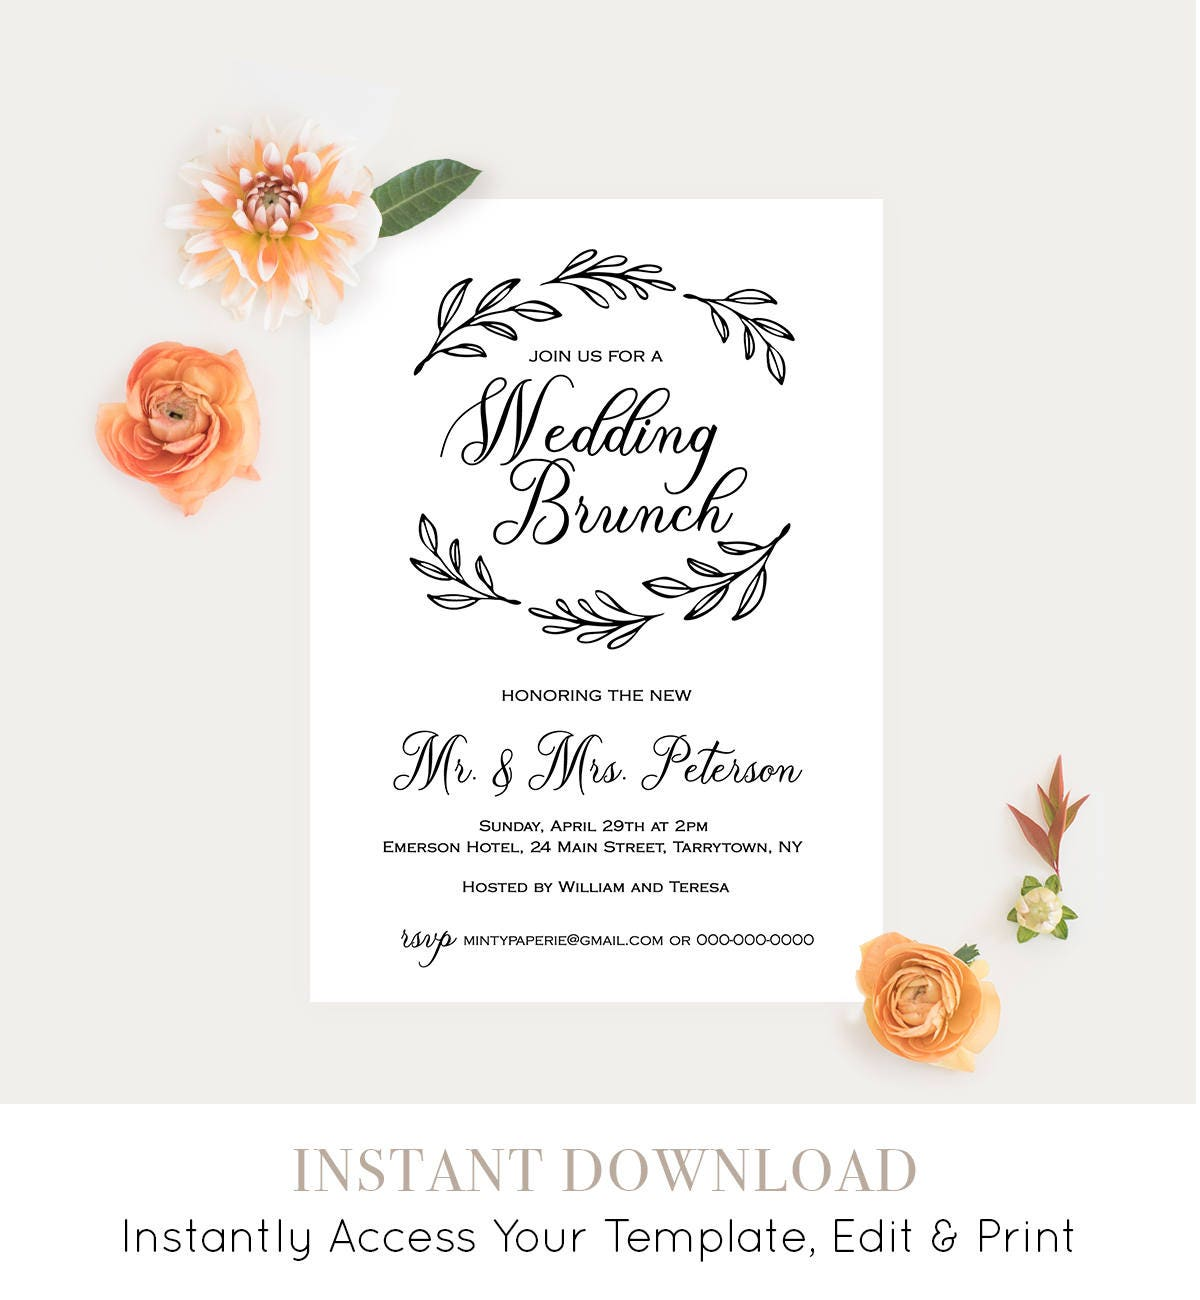 Wedding Brunch Template, Post Wedding Brunch Invitation, Fully ...